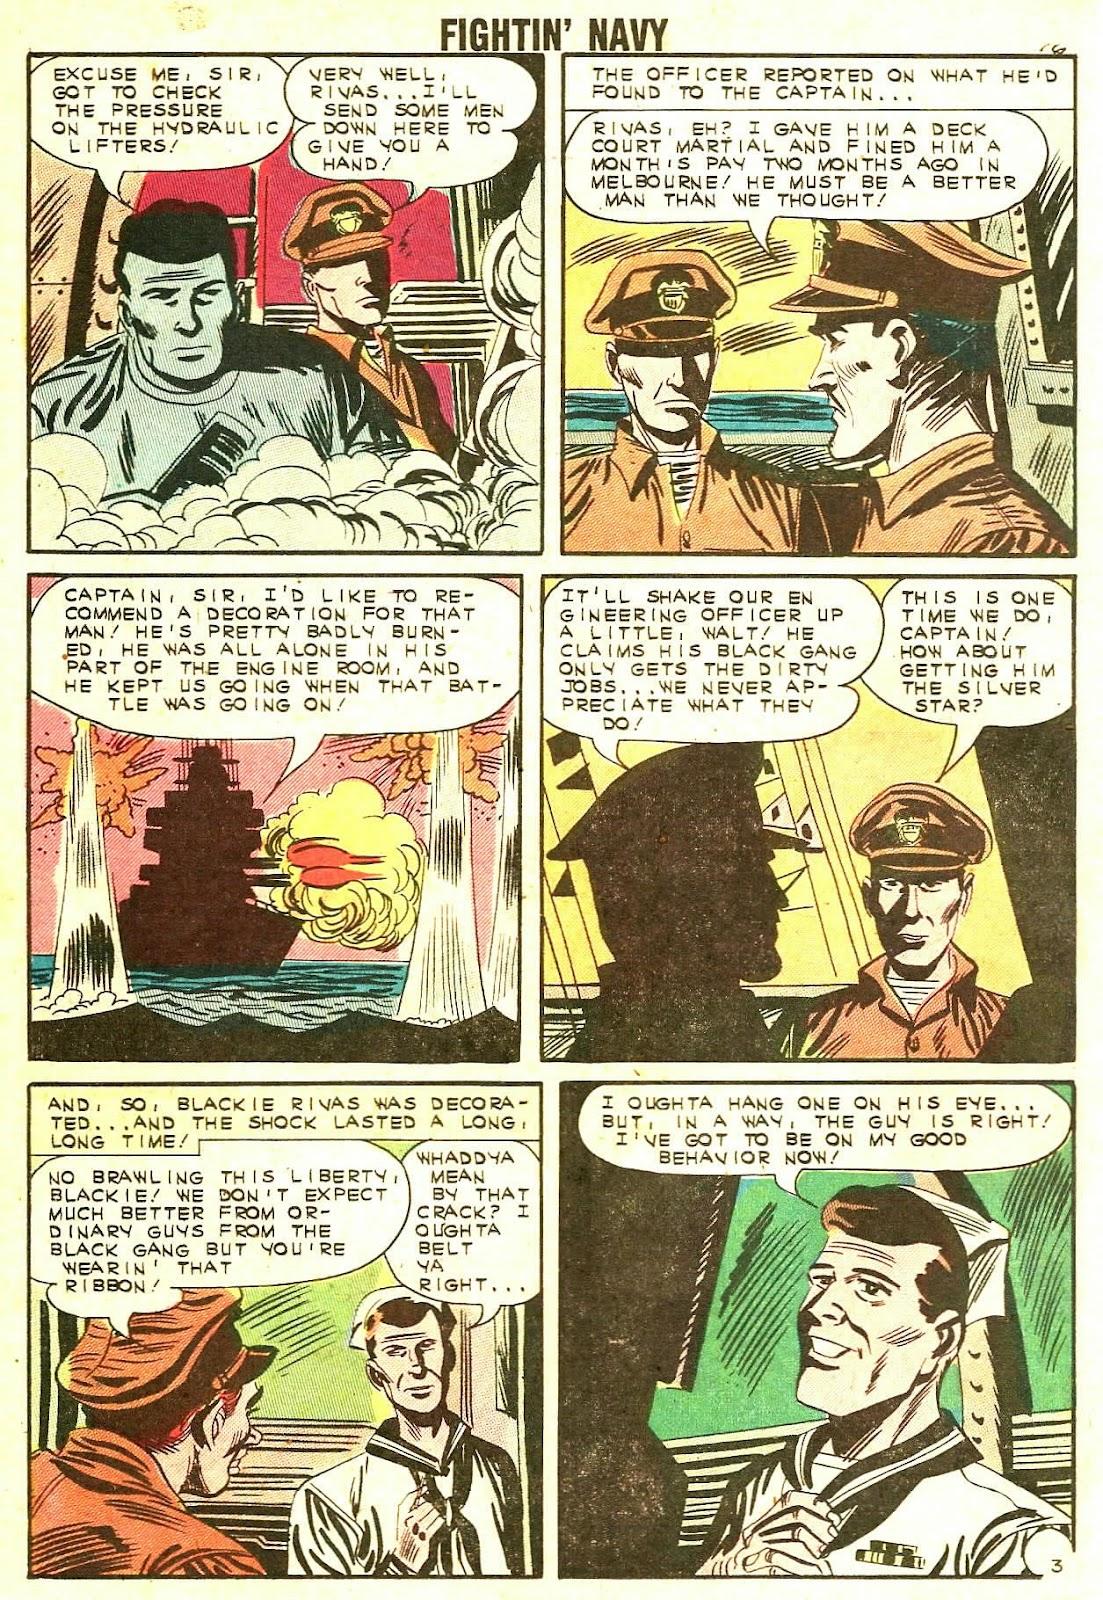 Read online Fightin' Navy comic -  Issue #110 - 18